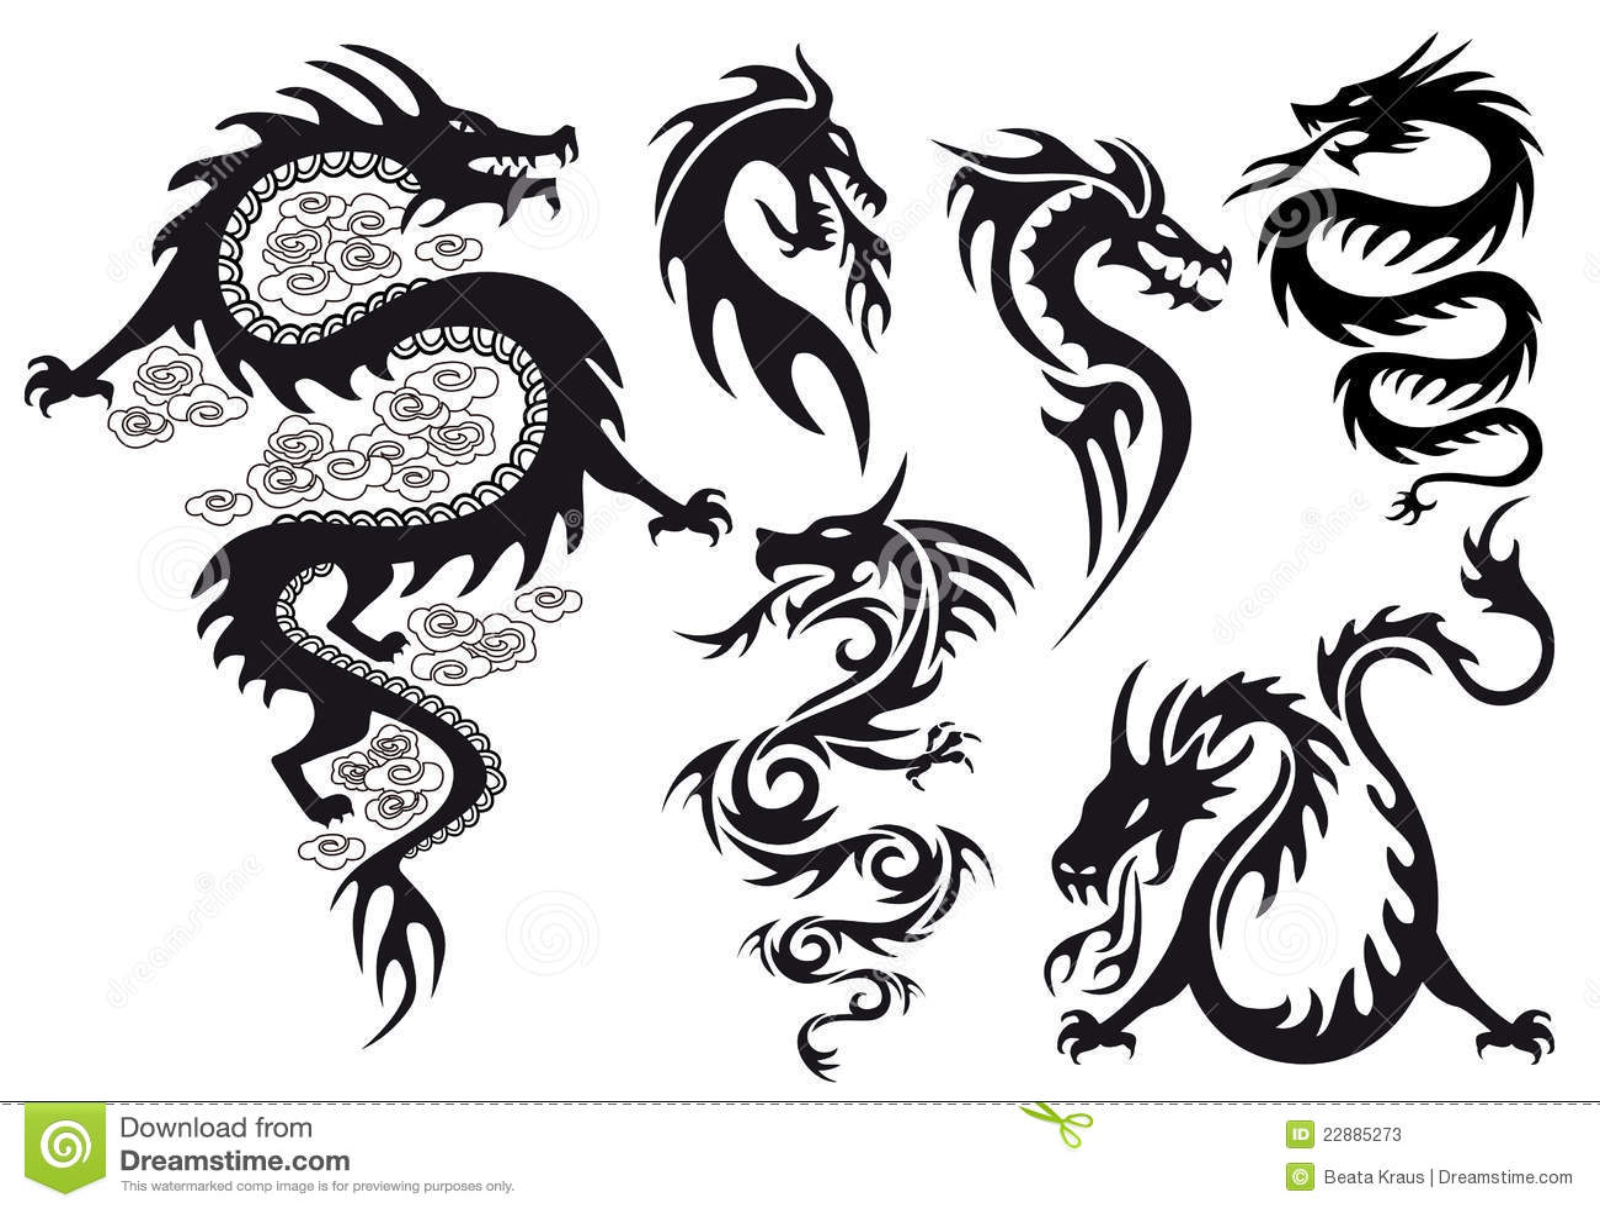 Dragon tattoo, vector